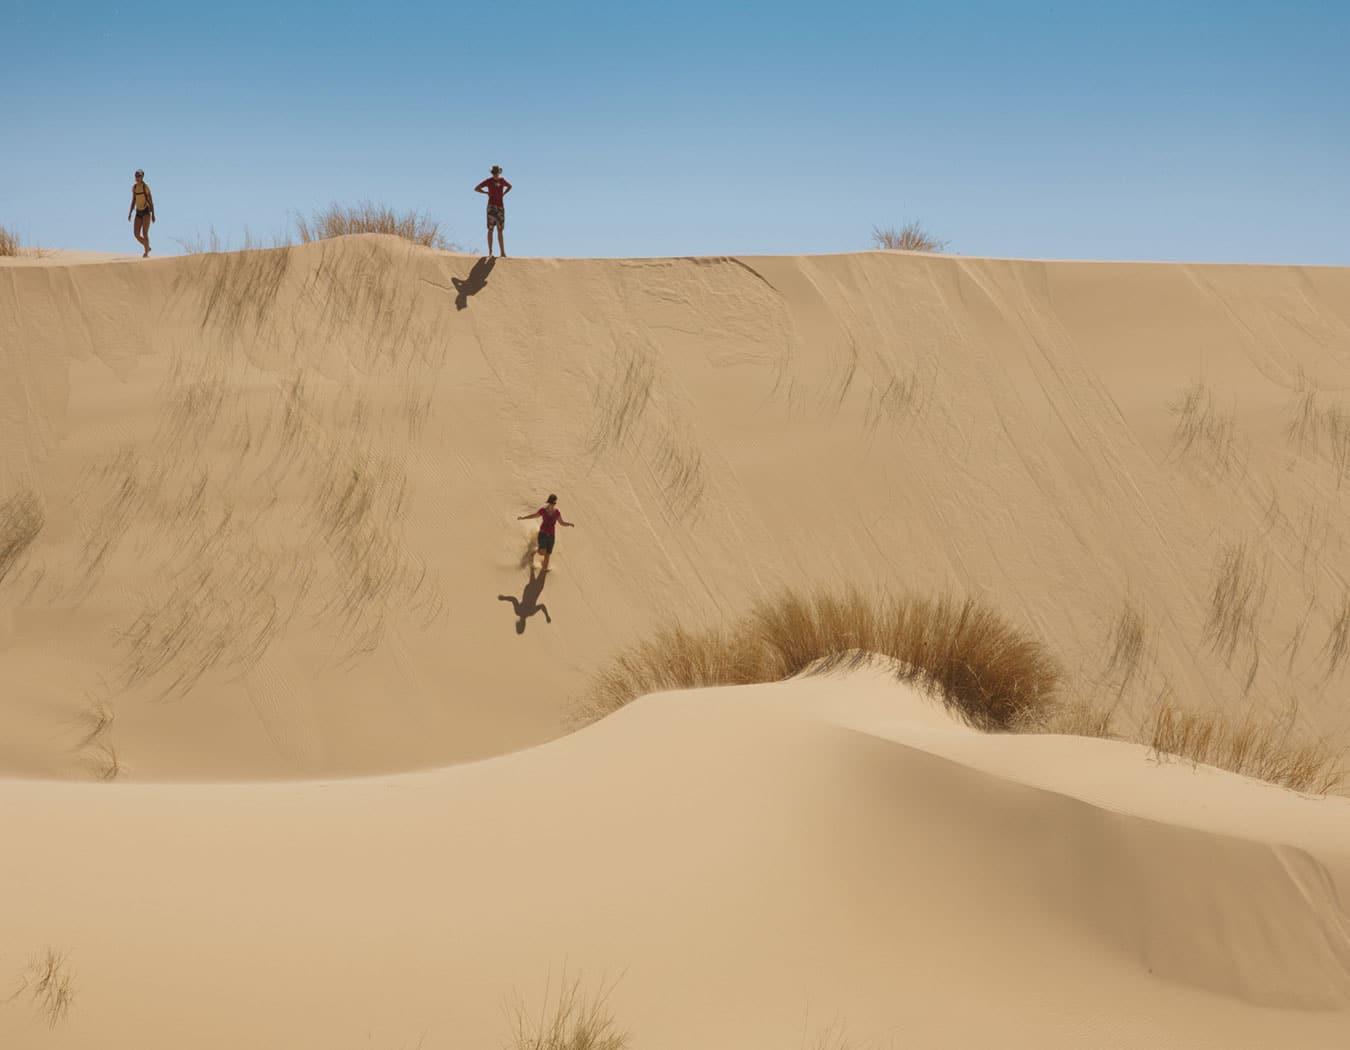 Cape Town Sandboarding